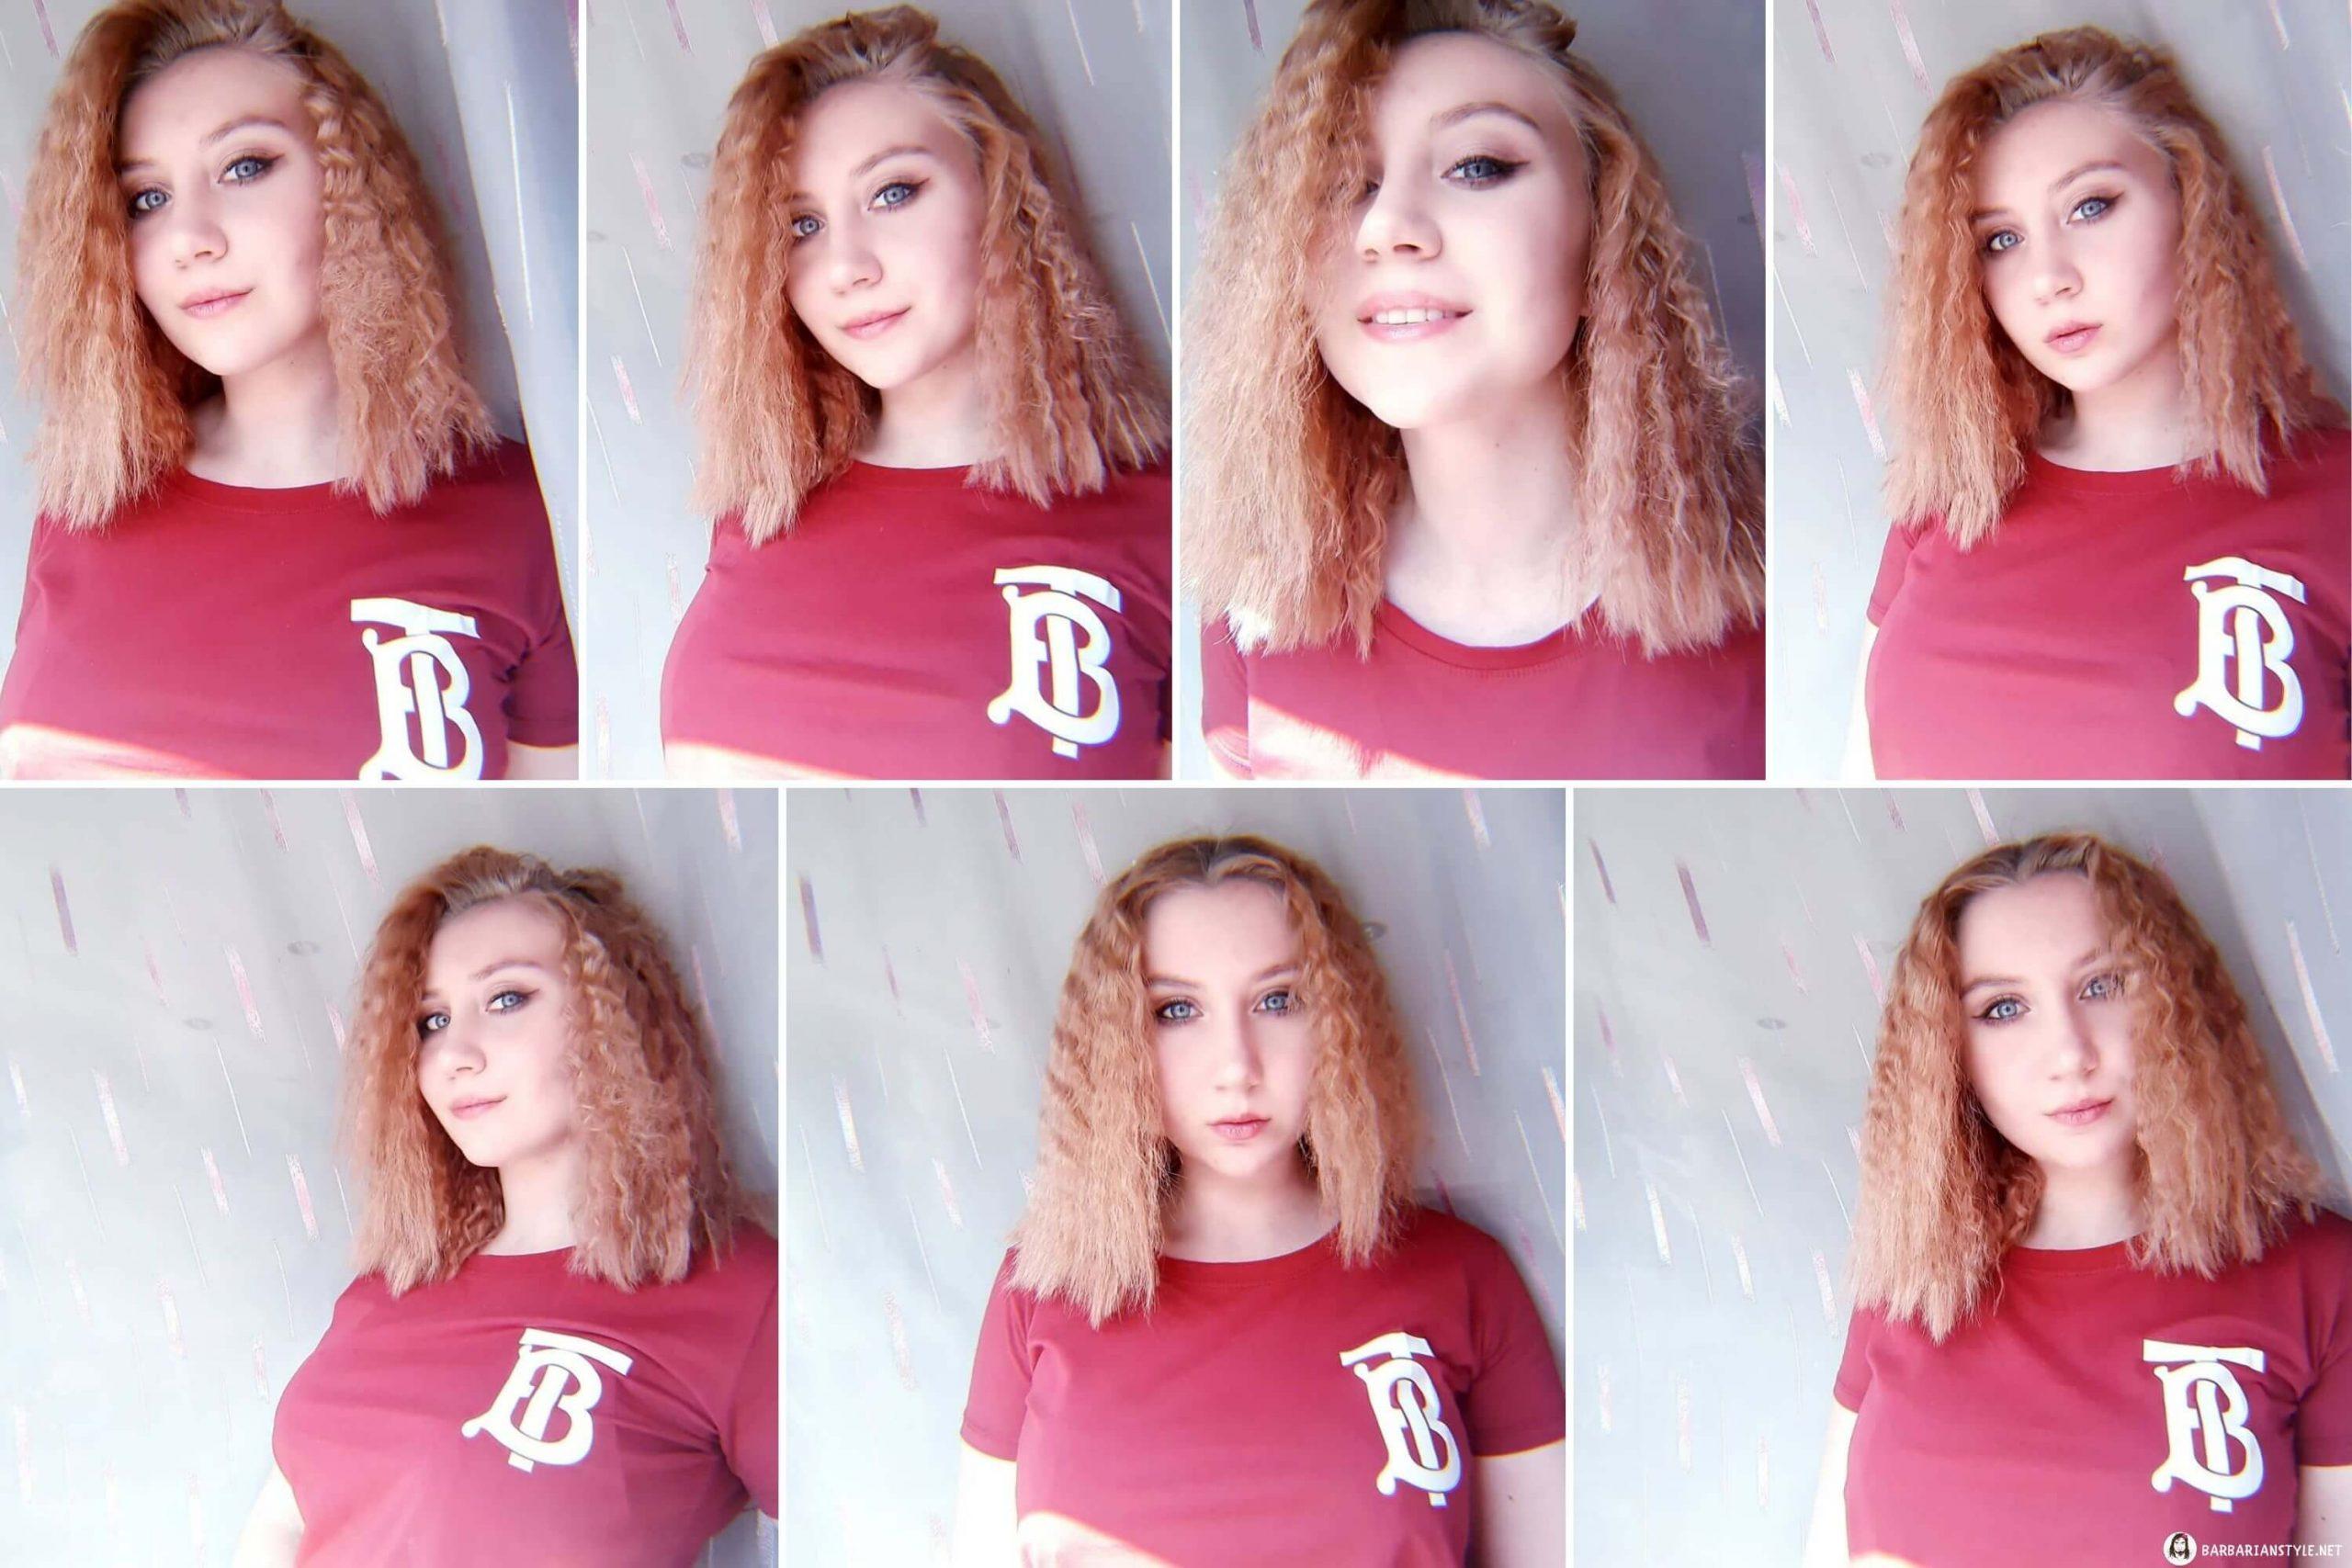 Shoulder-Length Curled Hair of Light Brown Color